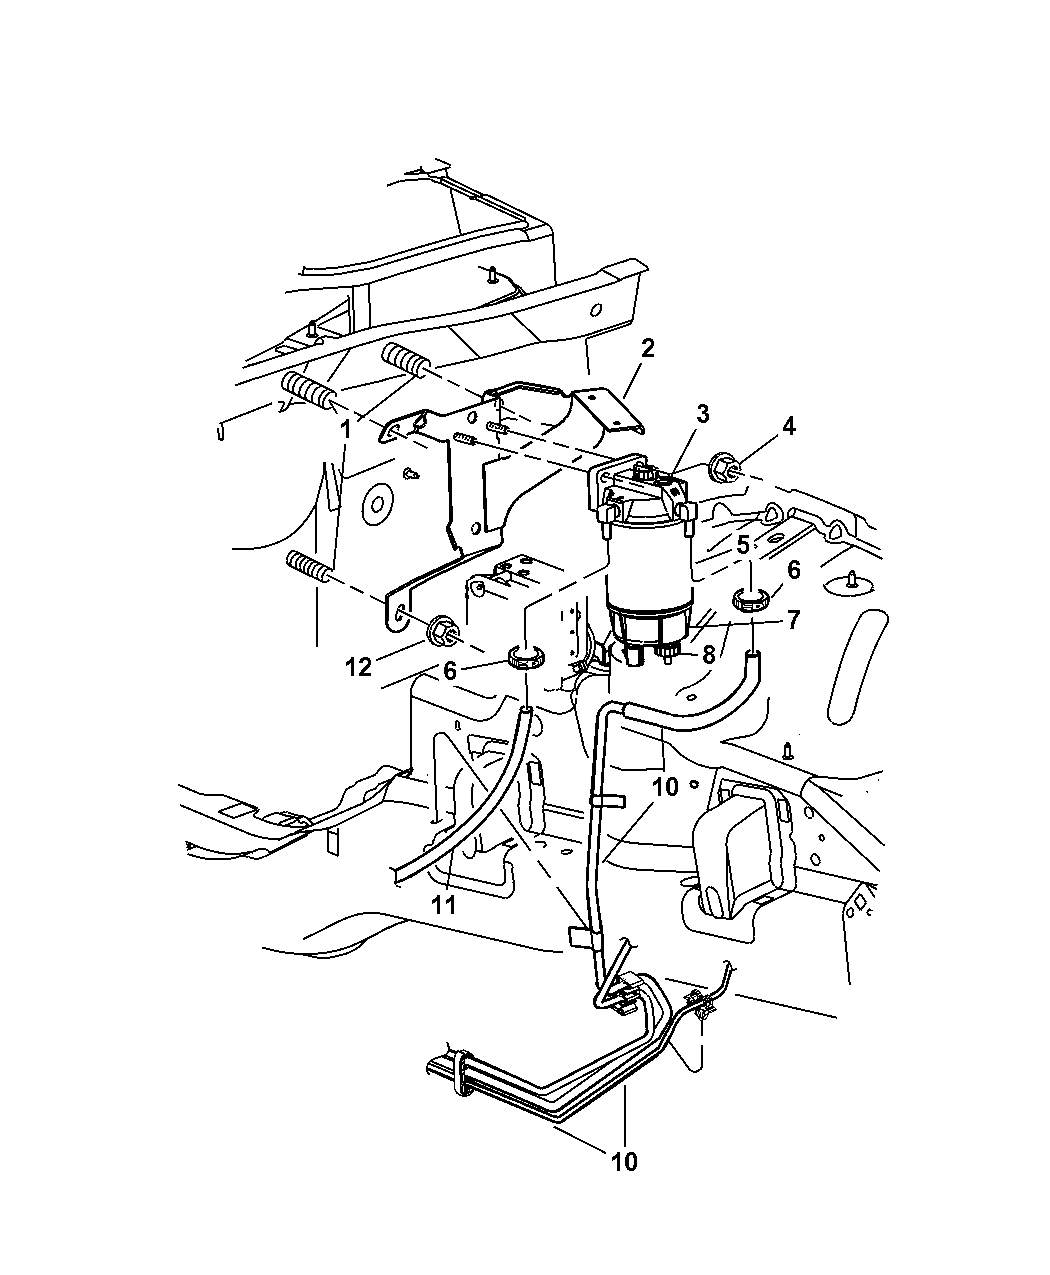 [WRG-7488] 03 Jeep Liberty Fuel Filter